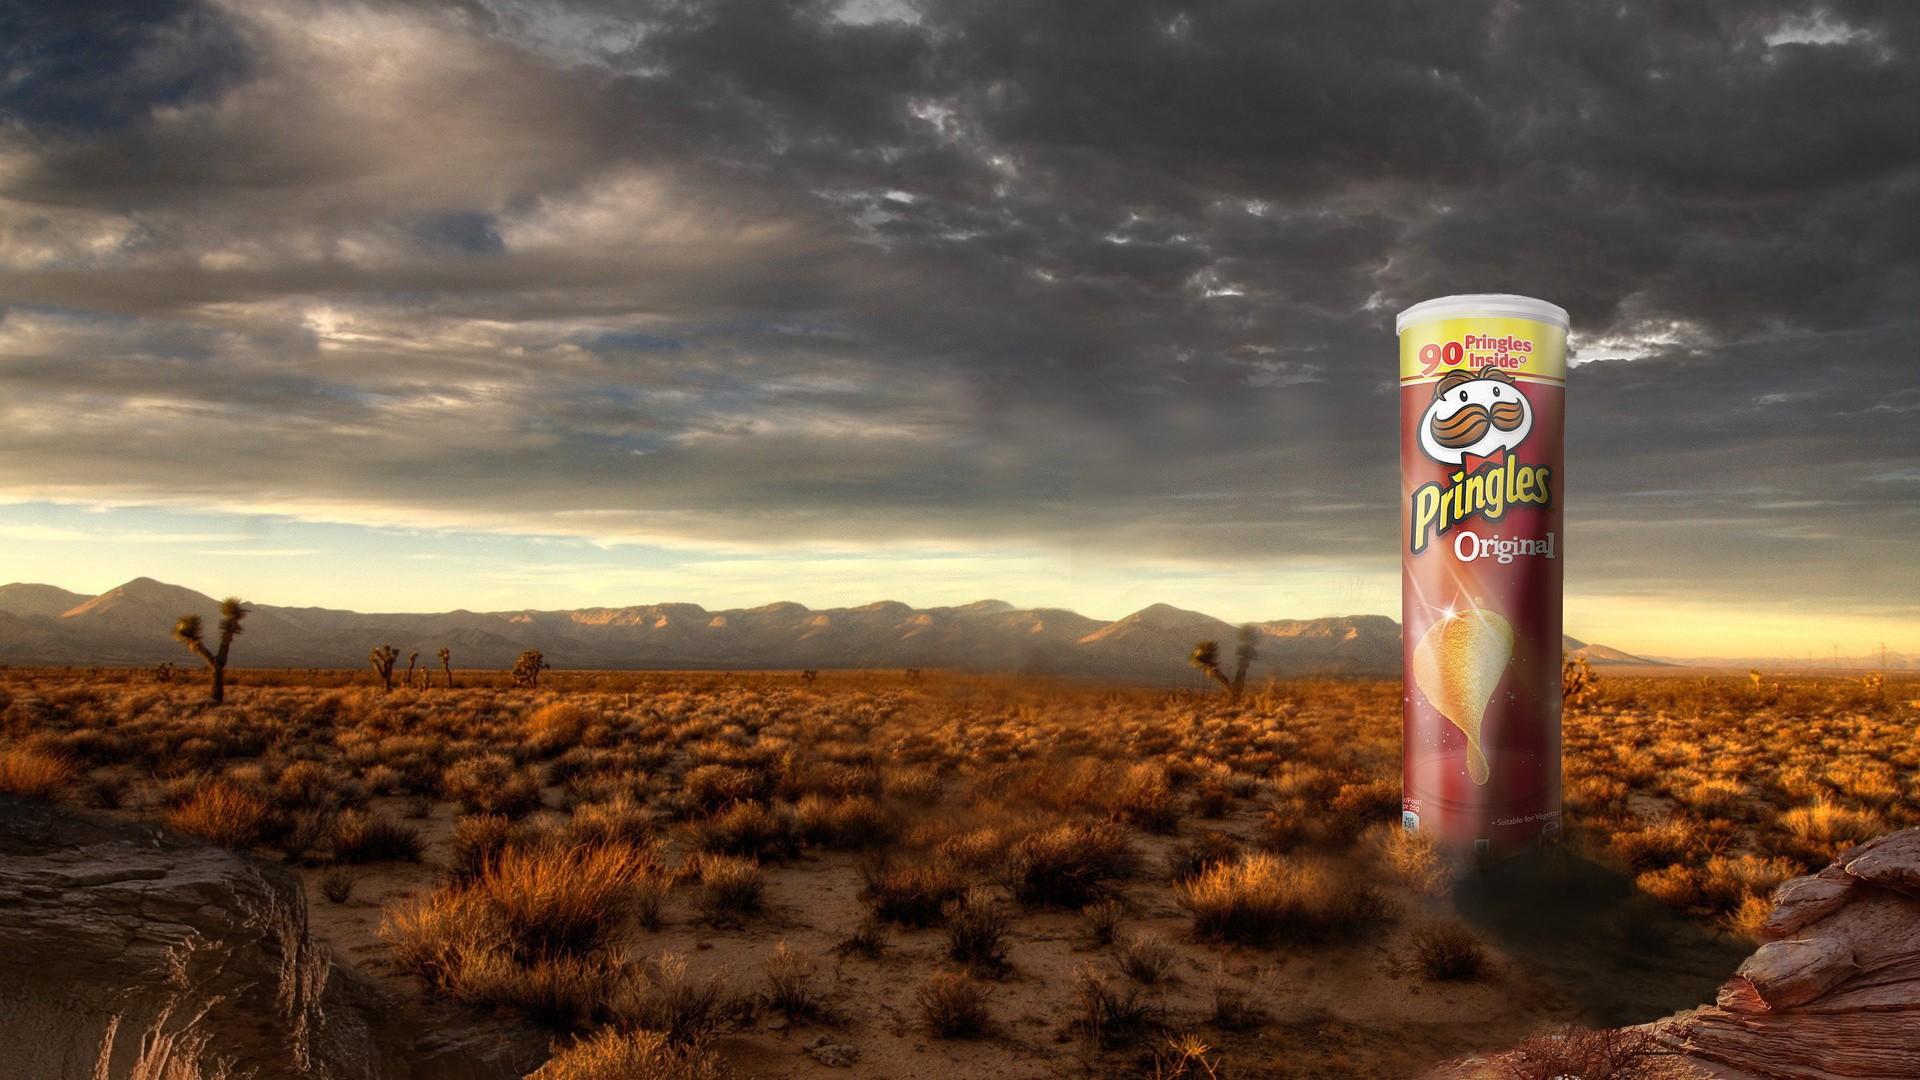 Pringles HD Wallpapers 1920x1080